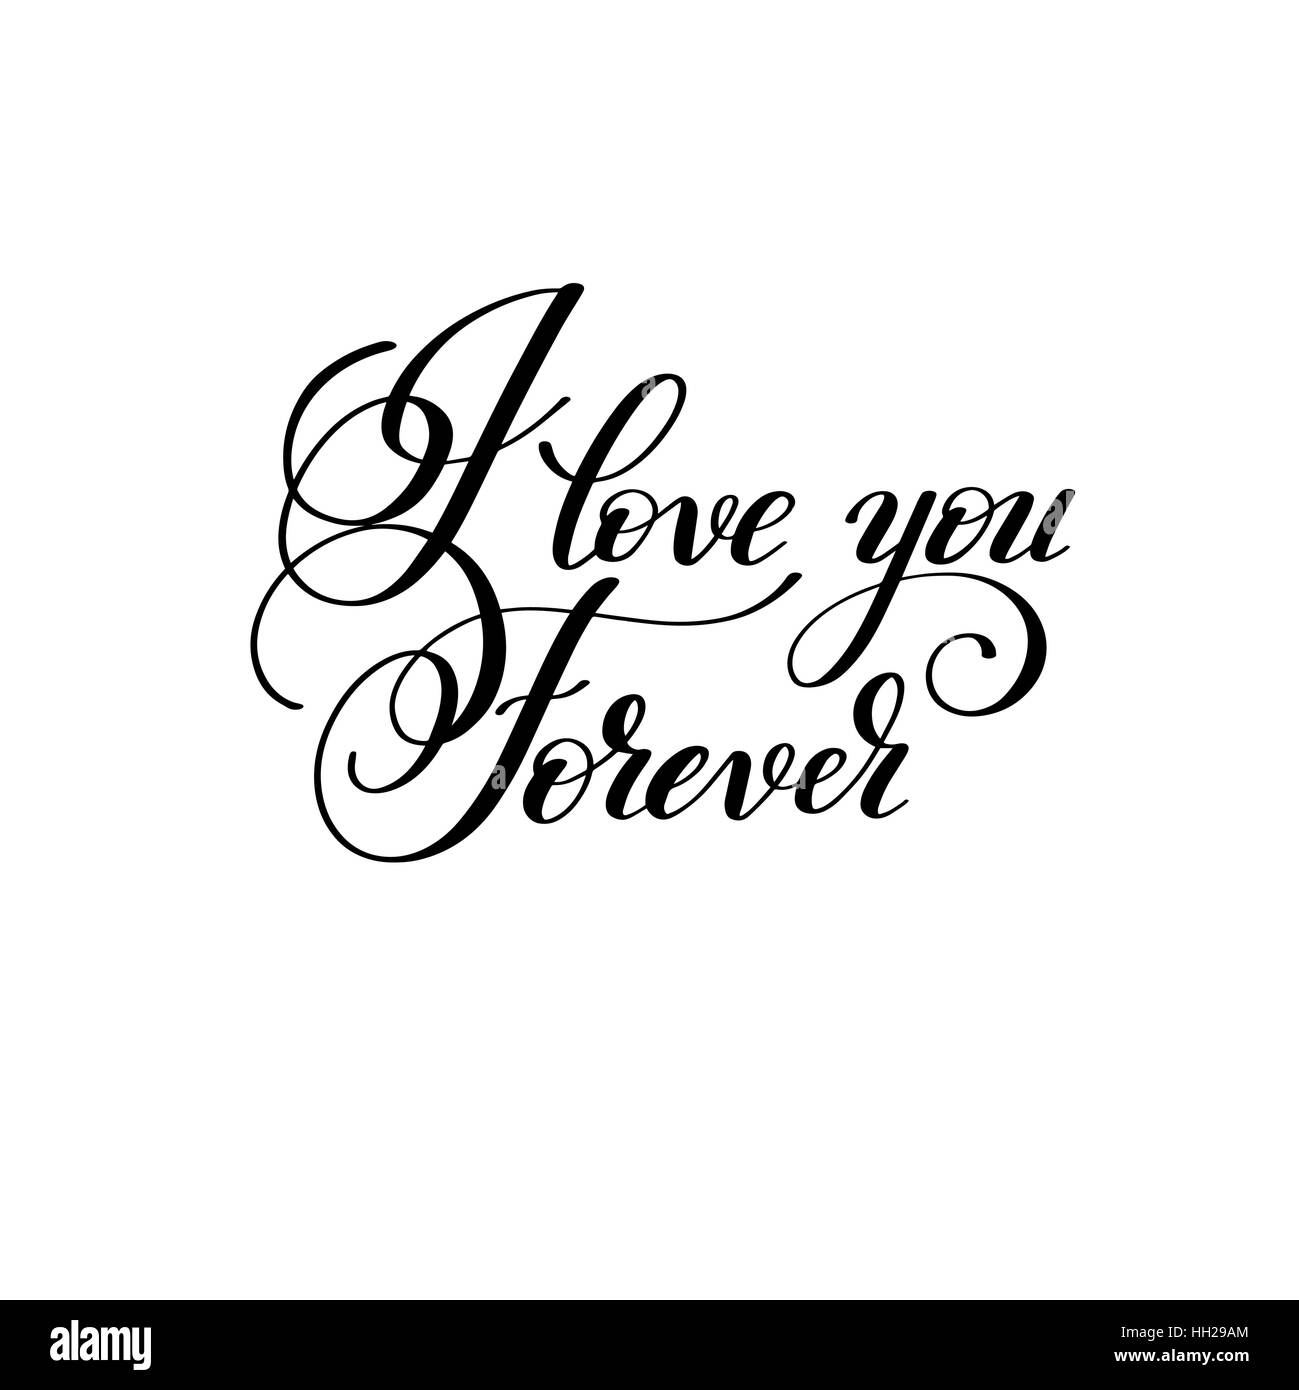 I Love You Forever Lettrage Manuscrit Citation Sur L Amour A Val